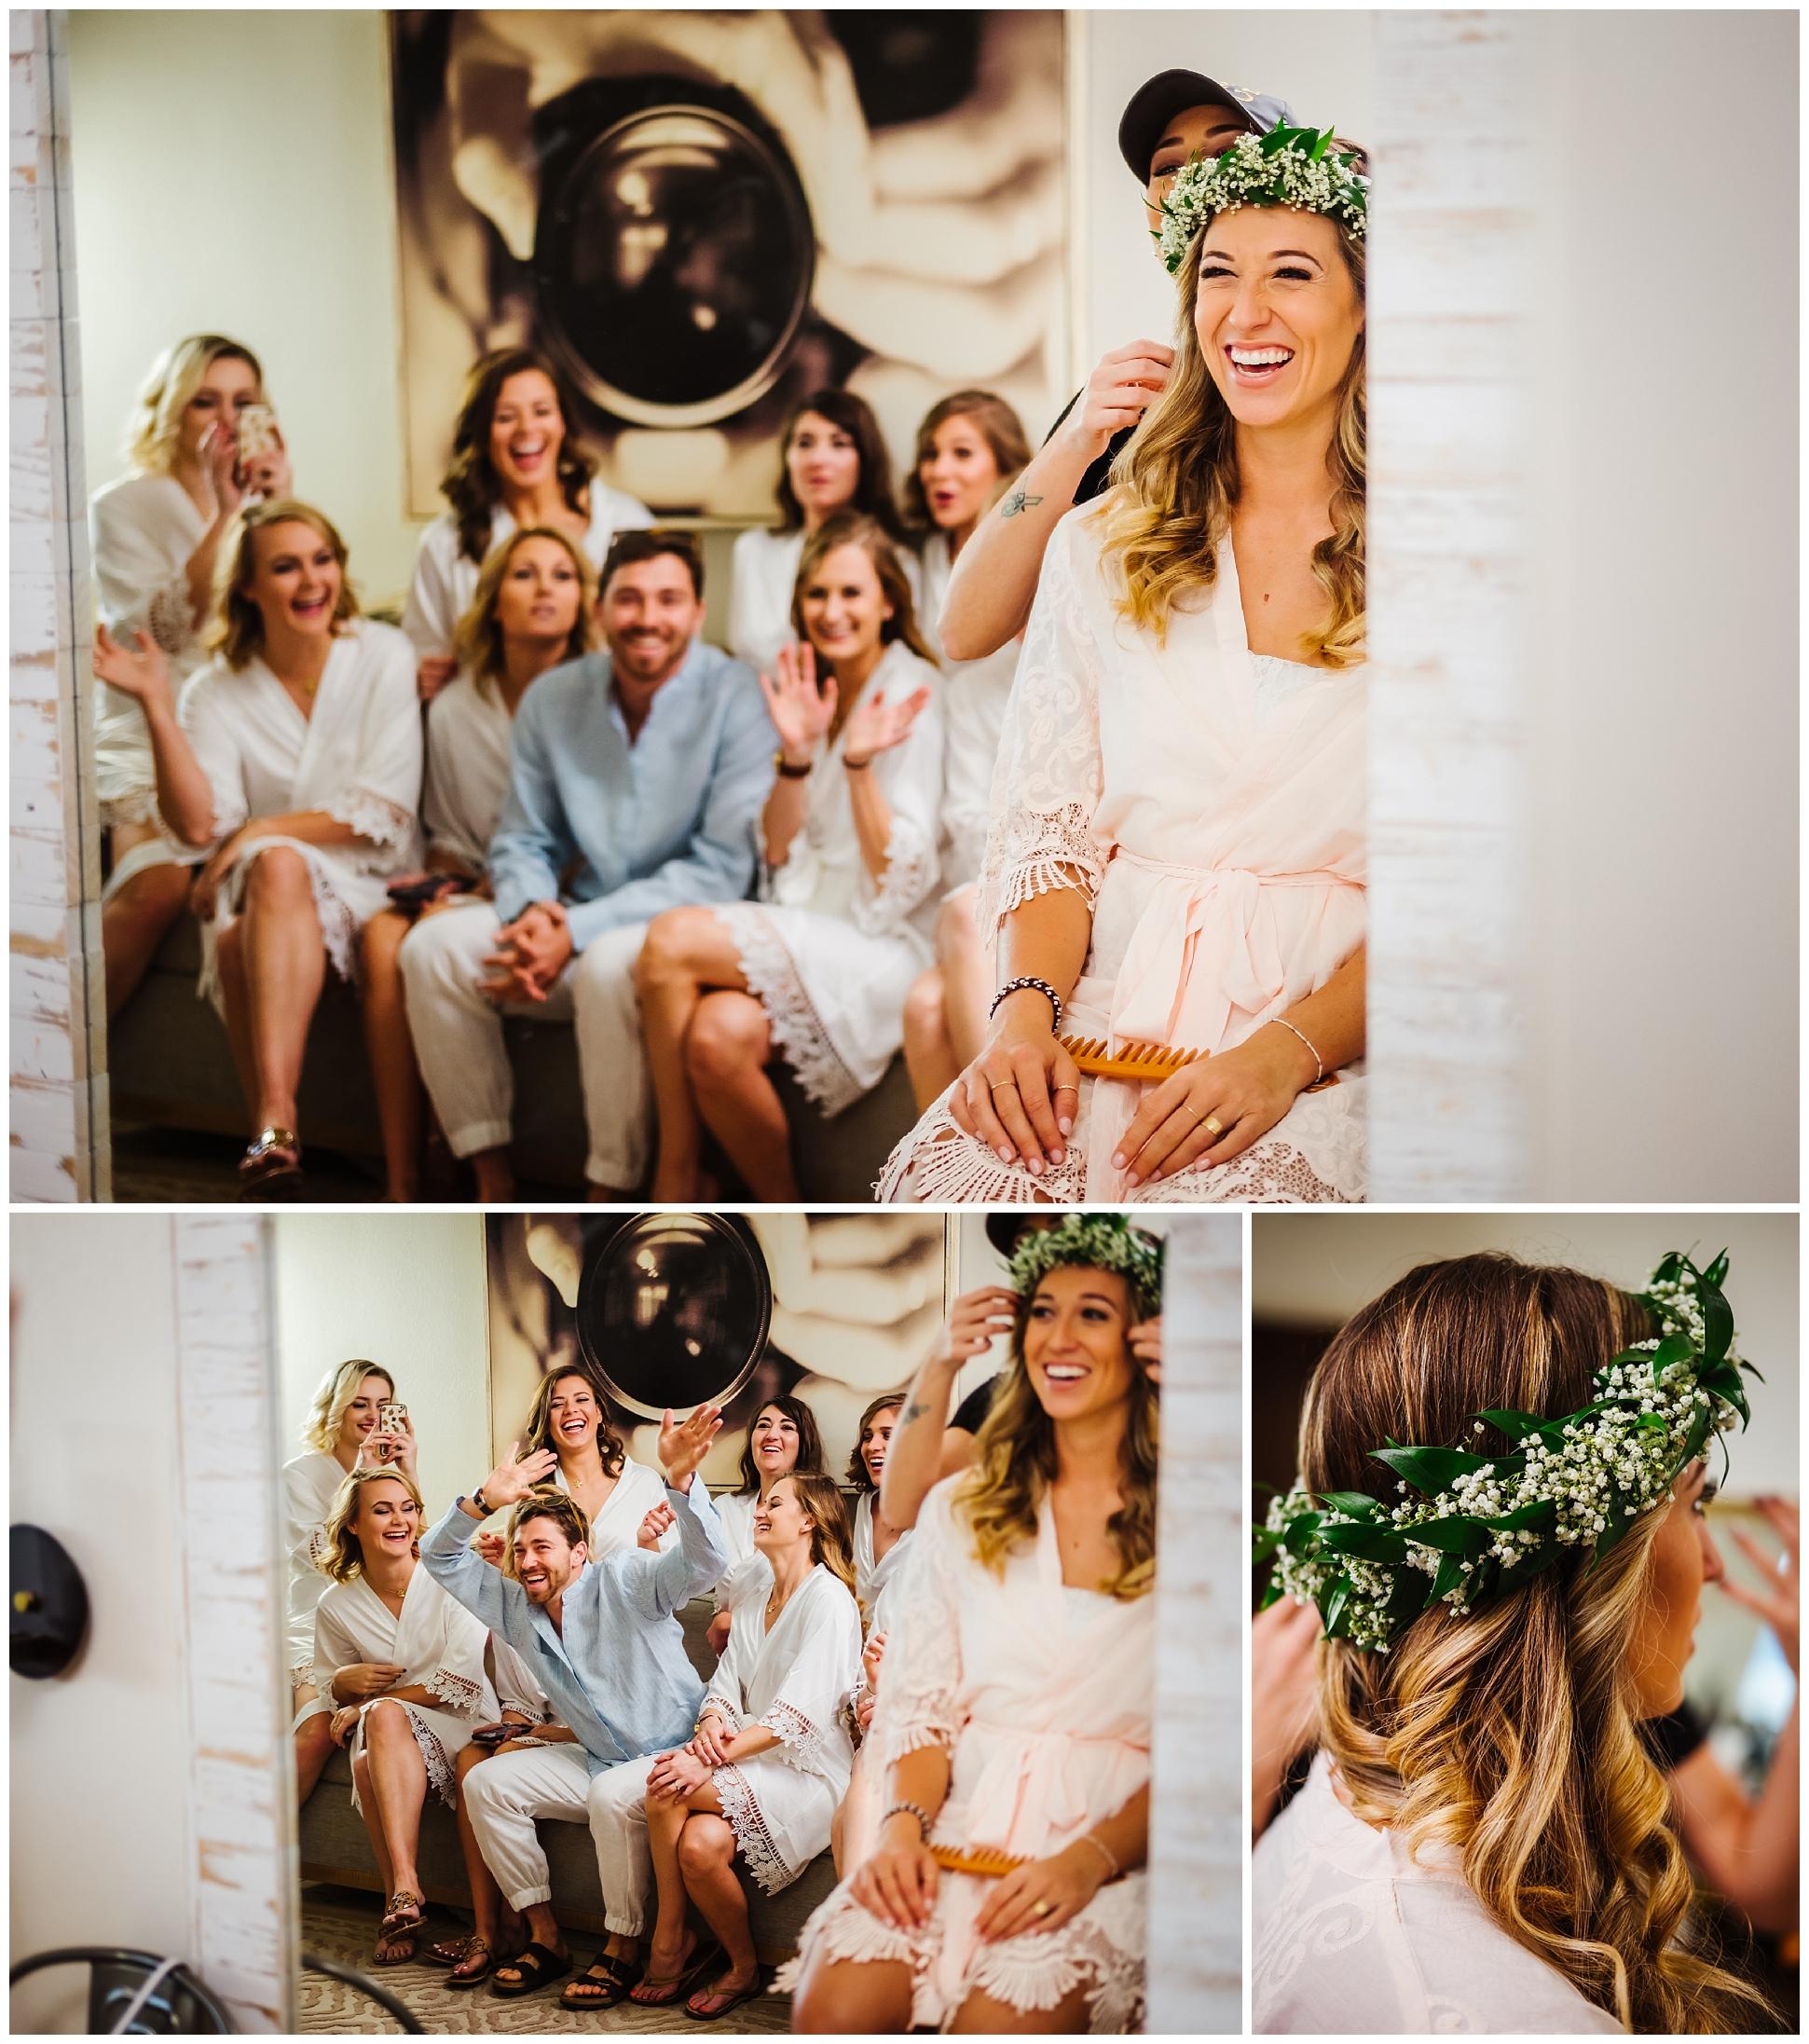 tampa-bay-wedding-photographer-barefoot-post-card-inn-tropical-hawaiin-lei-pink-pineapples-flower-crown_0118.jpg